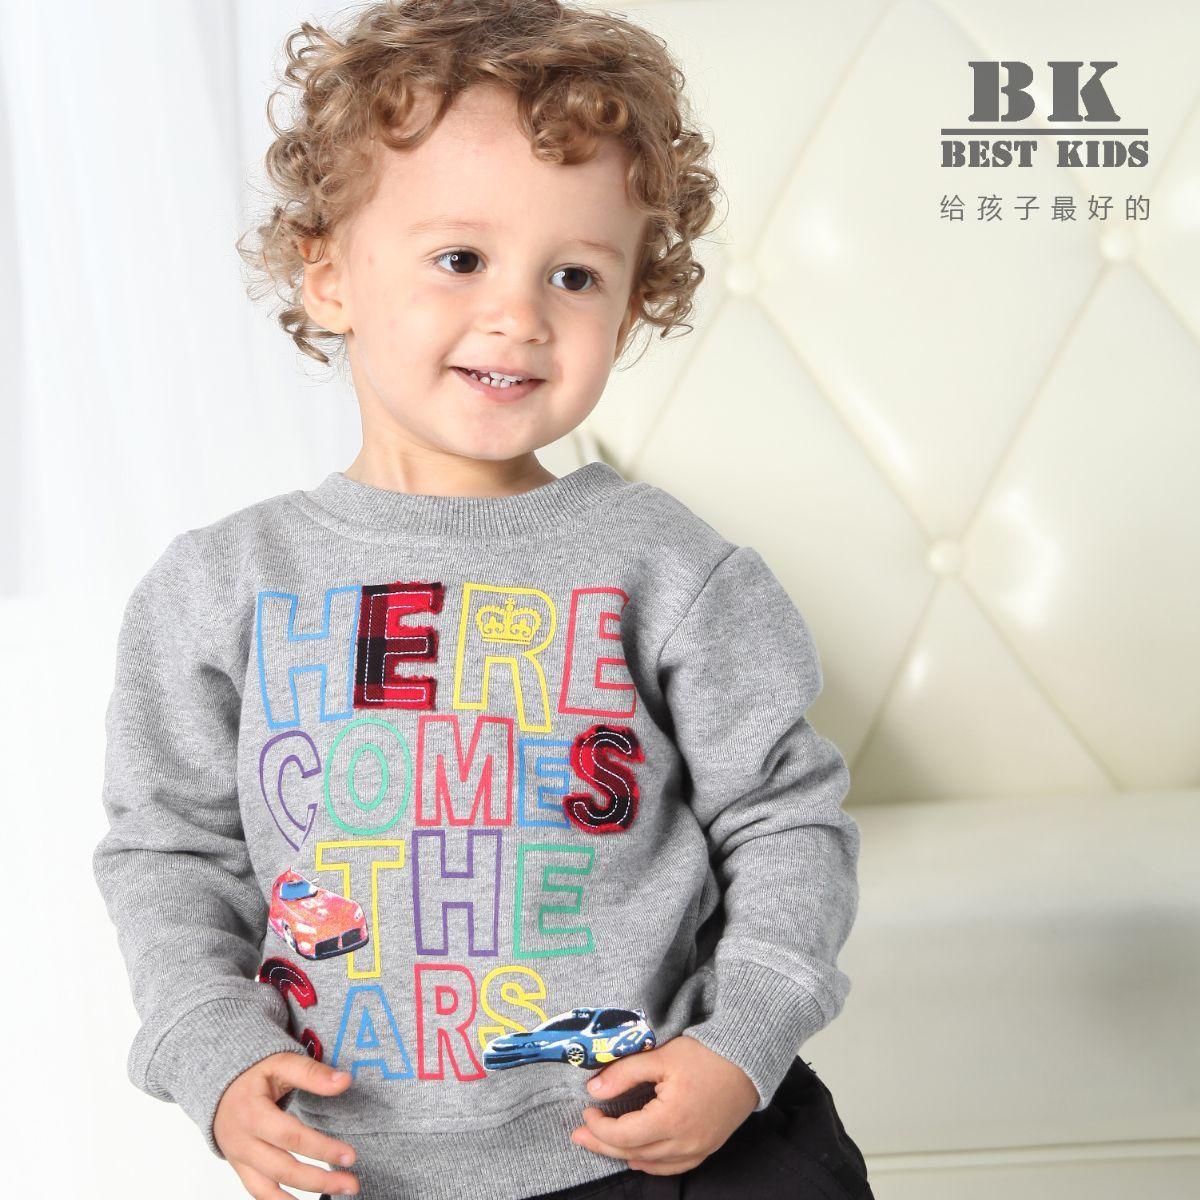 PL007 Jessie store Baby Kids & Maternity High version V2 Clothing Sets